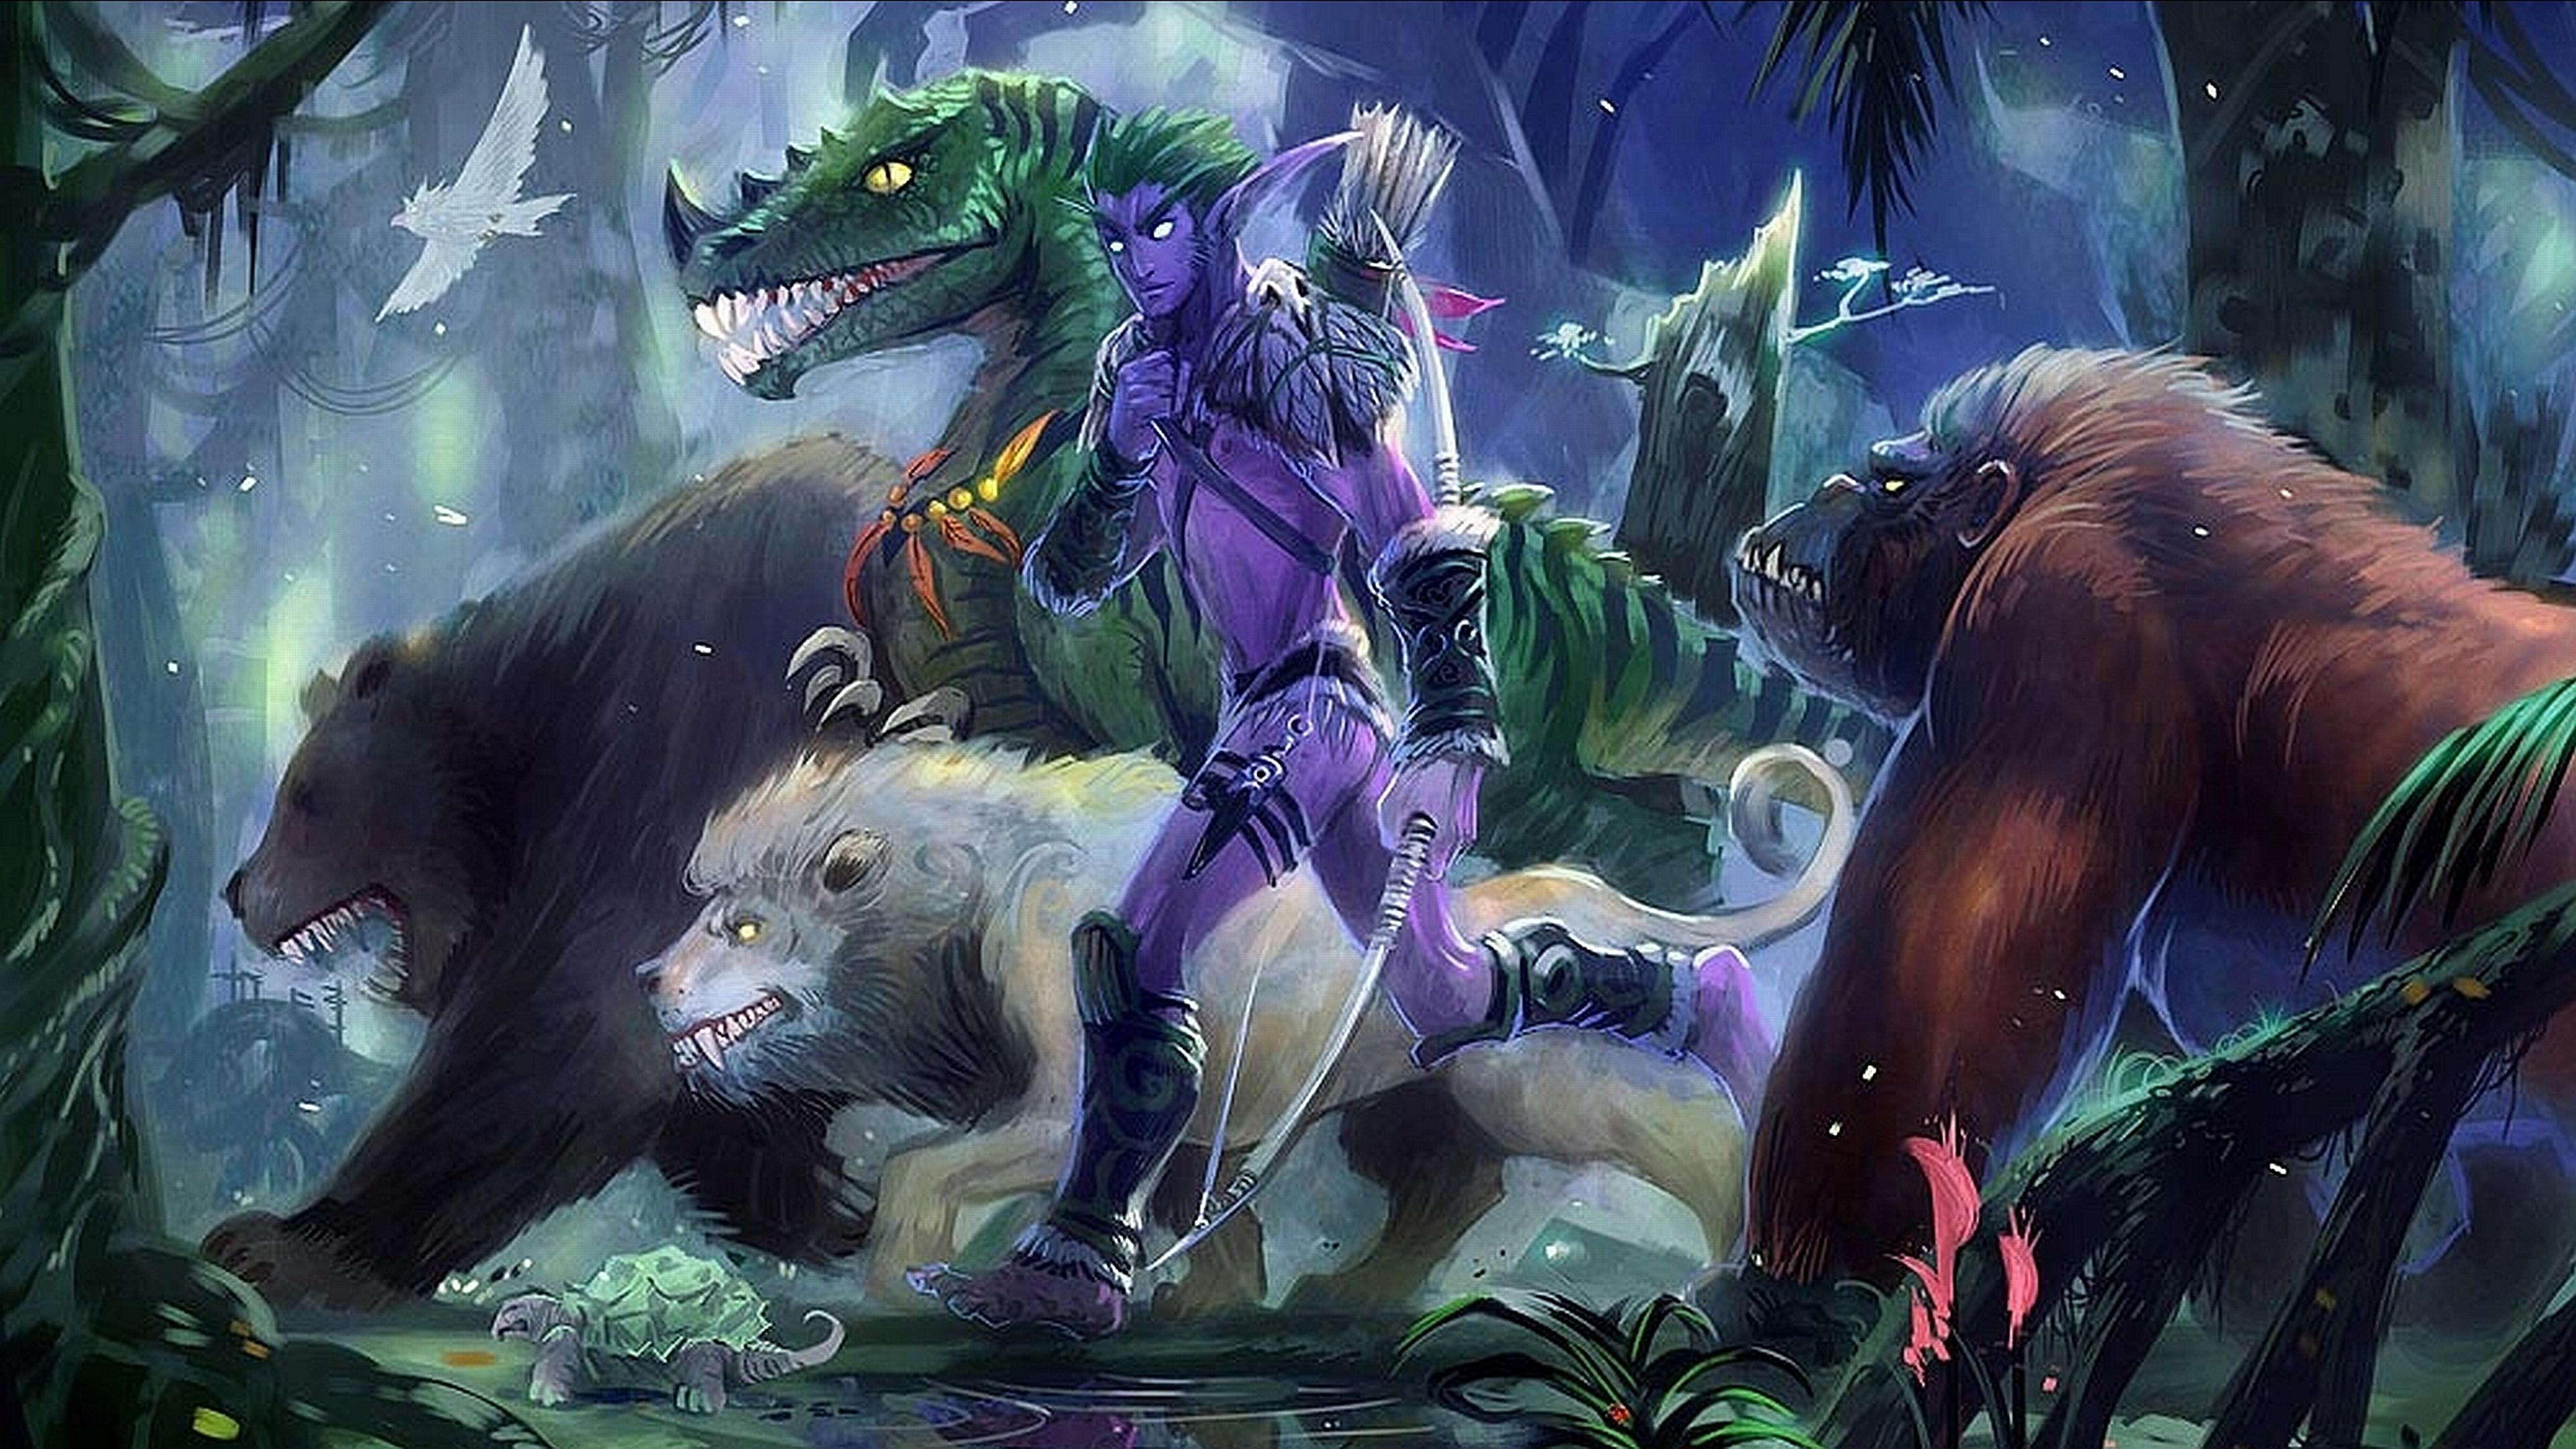 Jungle Wallpaper World Of Warcraft: Creature 4k Ultra HD Wallpaper And Background Image